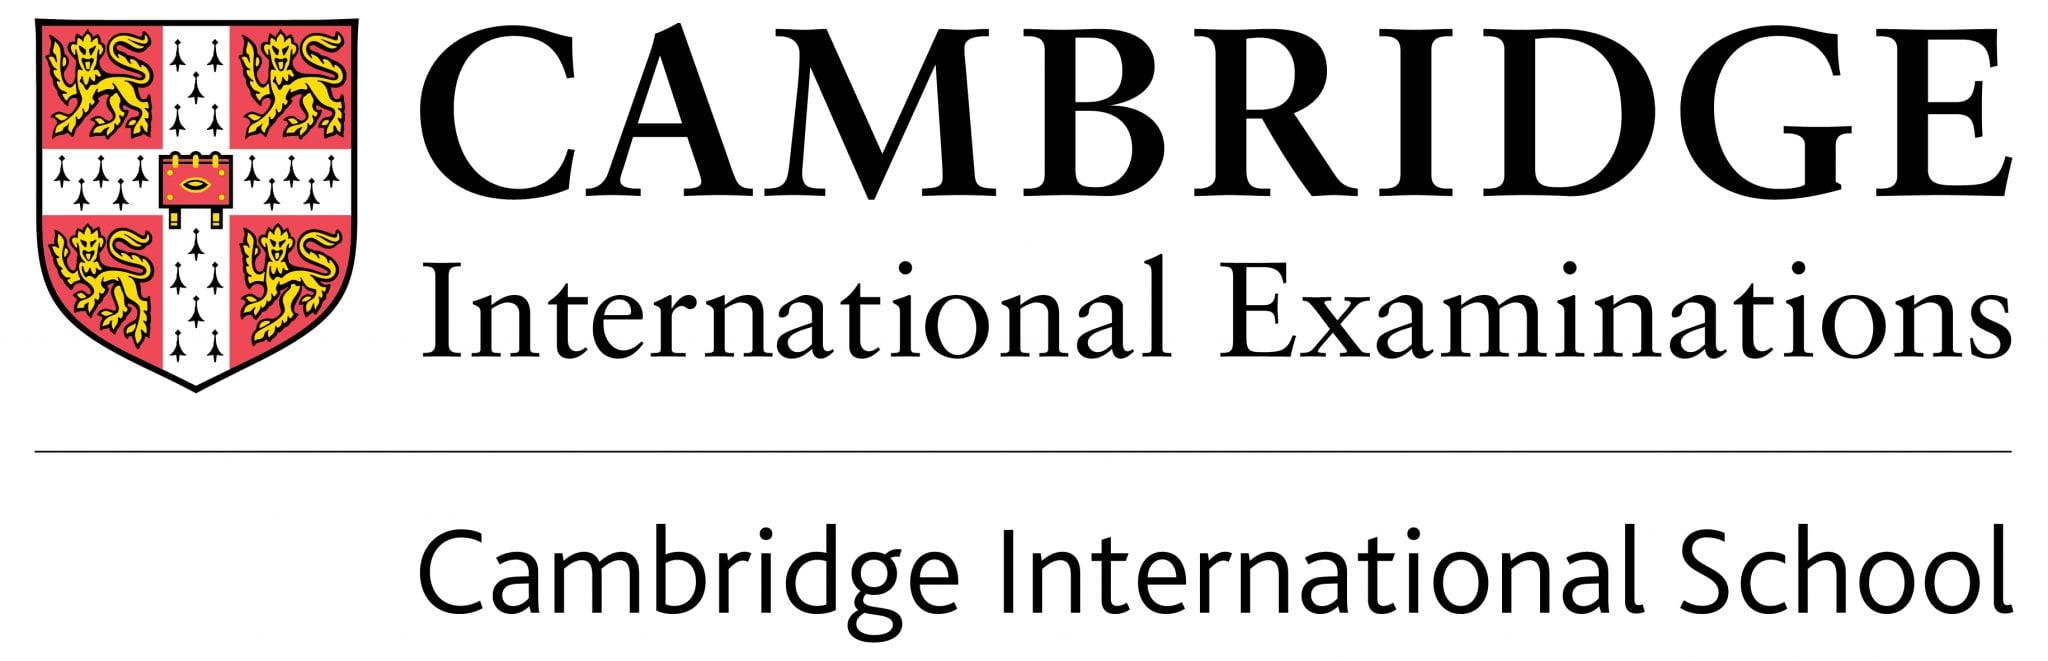 Cambridge International GCSE Results are announced today across Dubai Sharjah, Abu Dhabi Al Ain, Fujeirah the UAE.